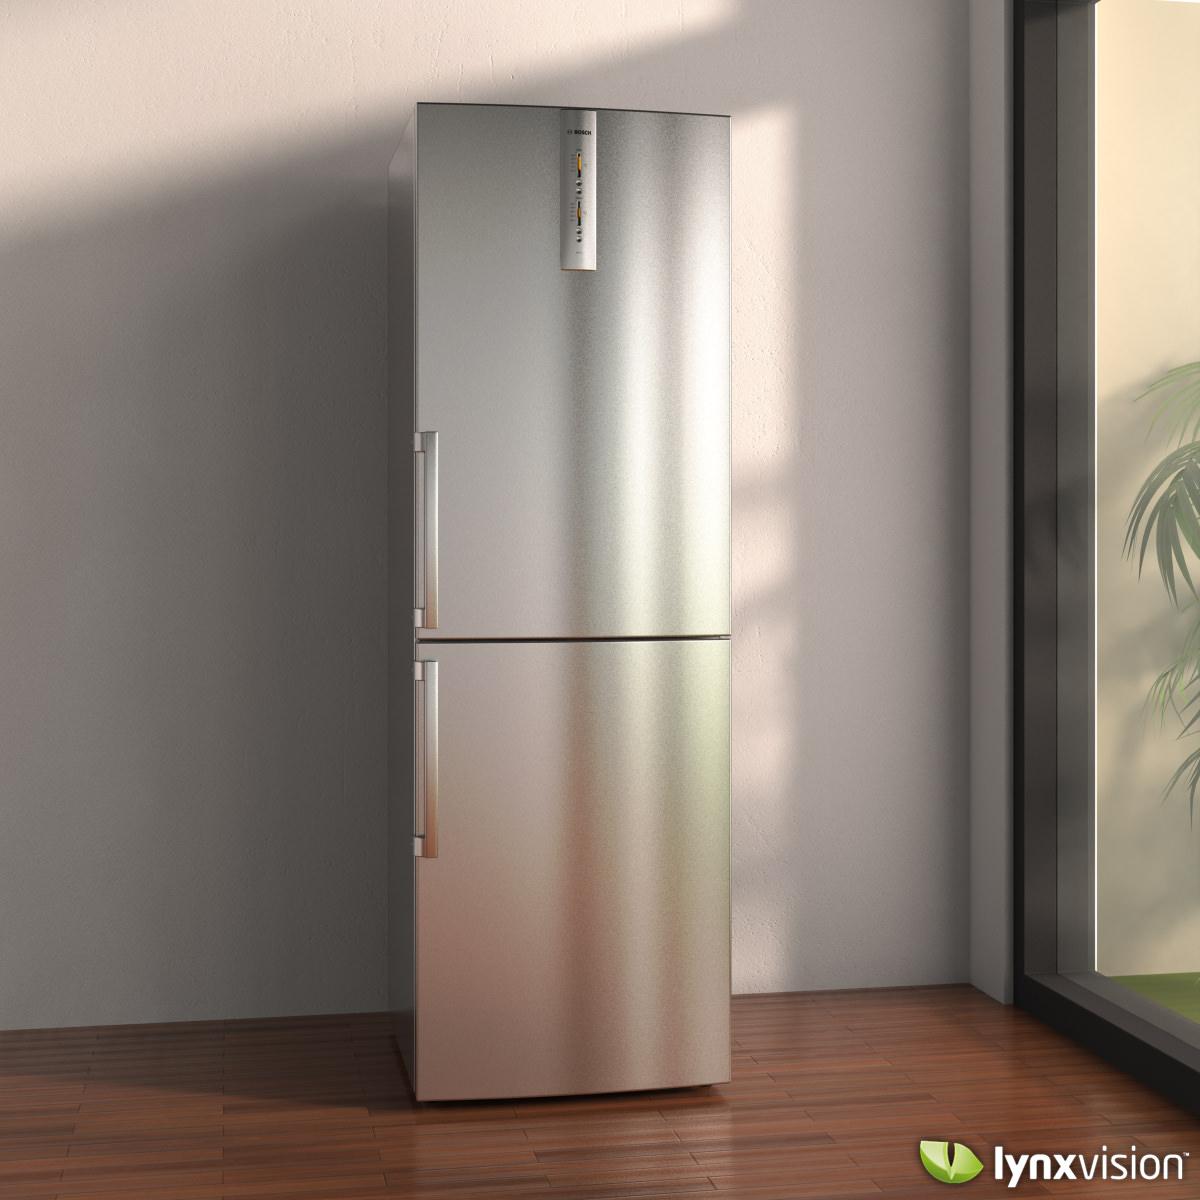 Bosch Bottom Freezer Refrigerator 3d Model Max Obj Fbx